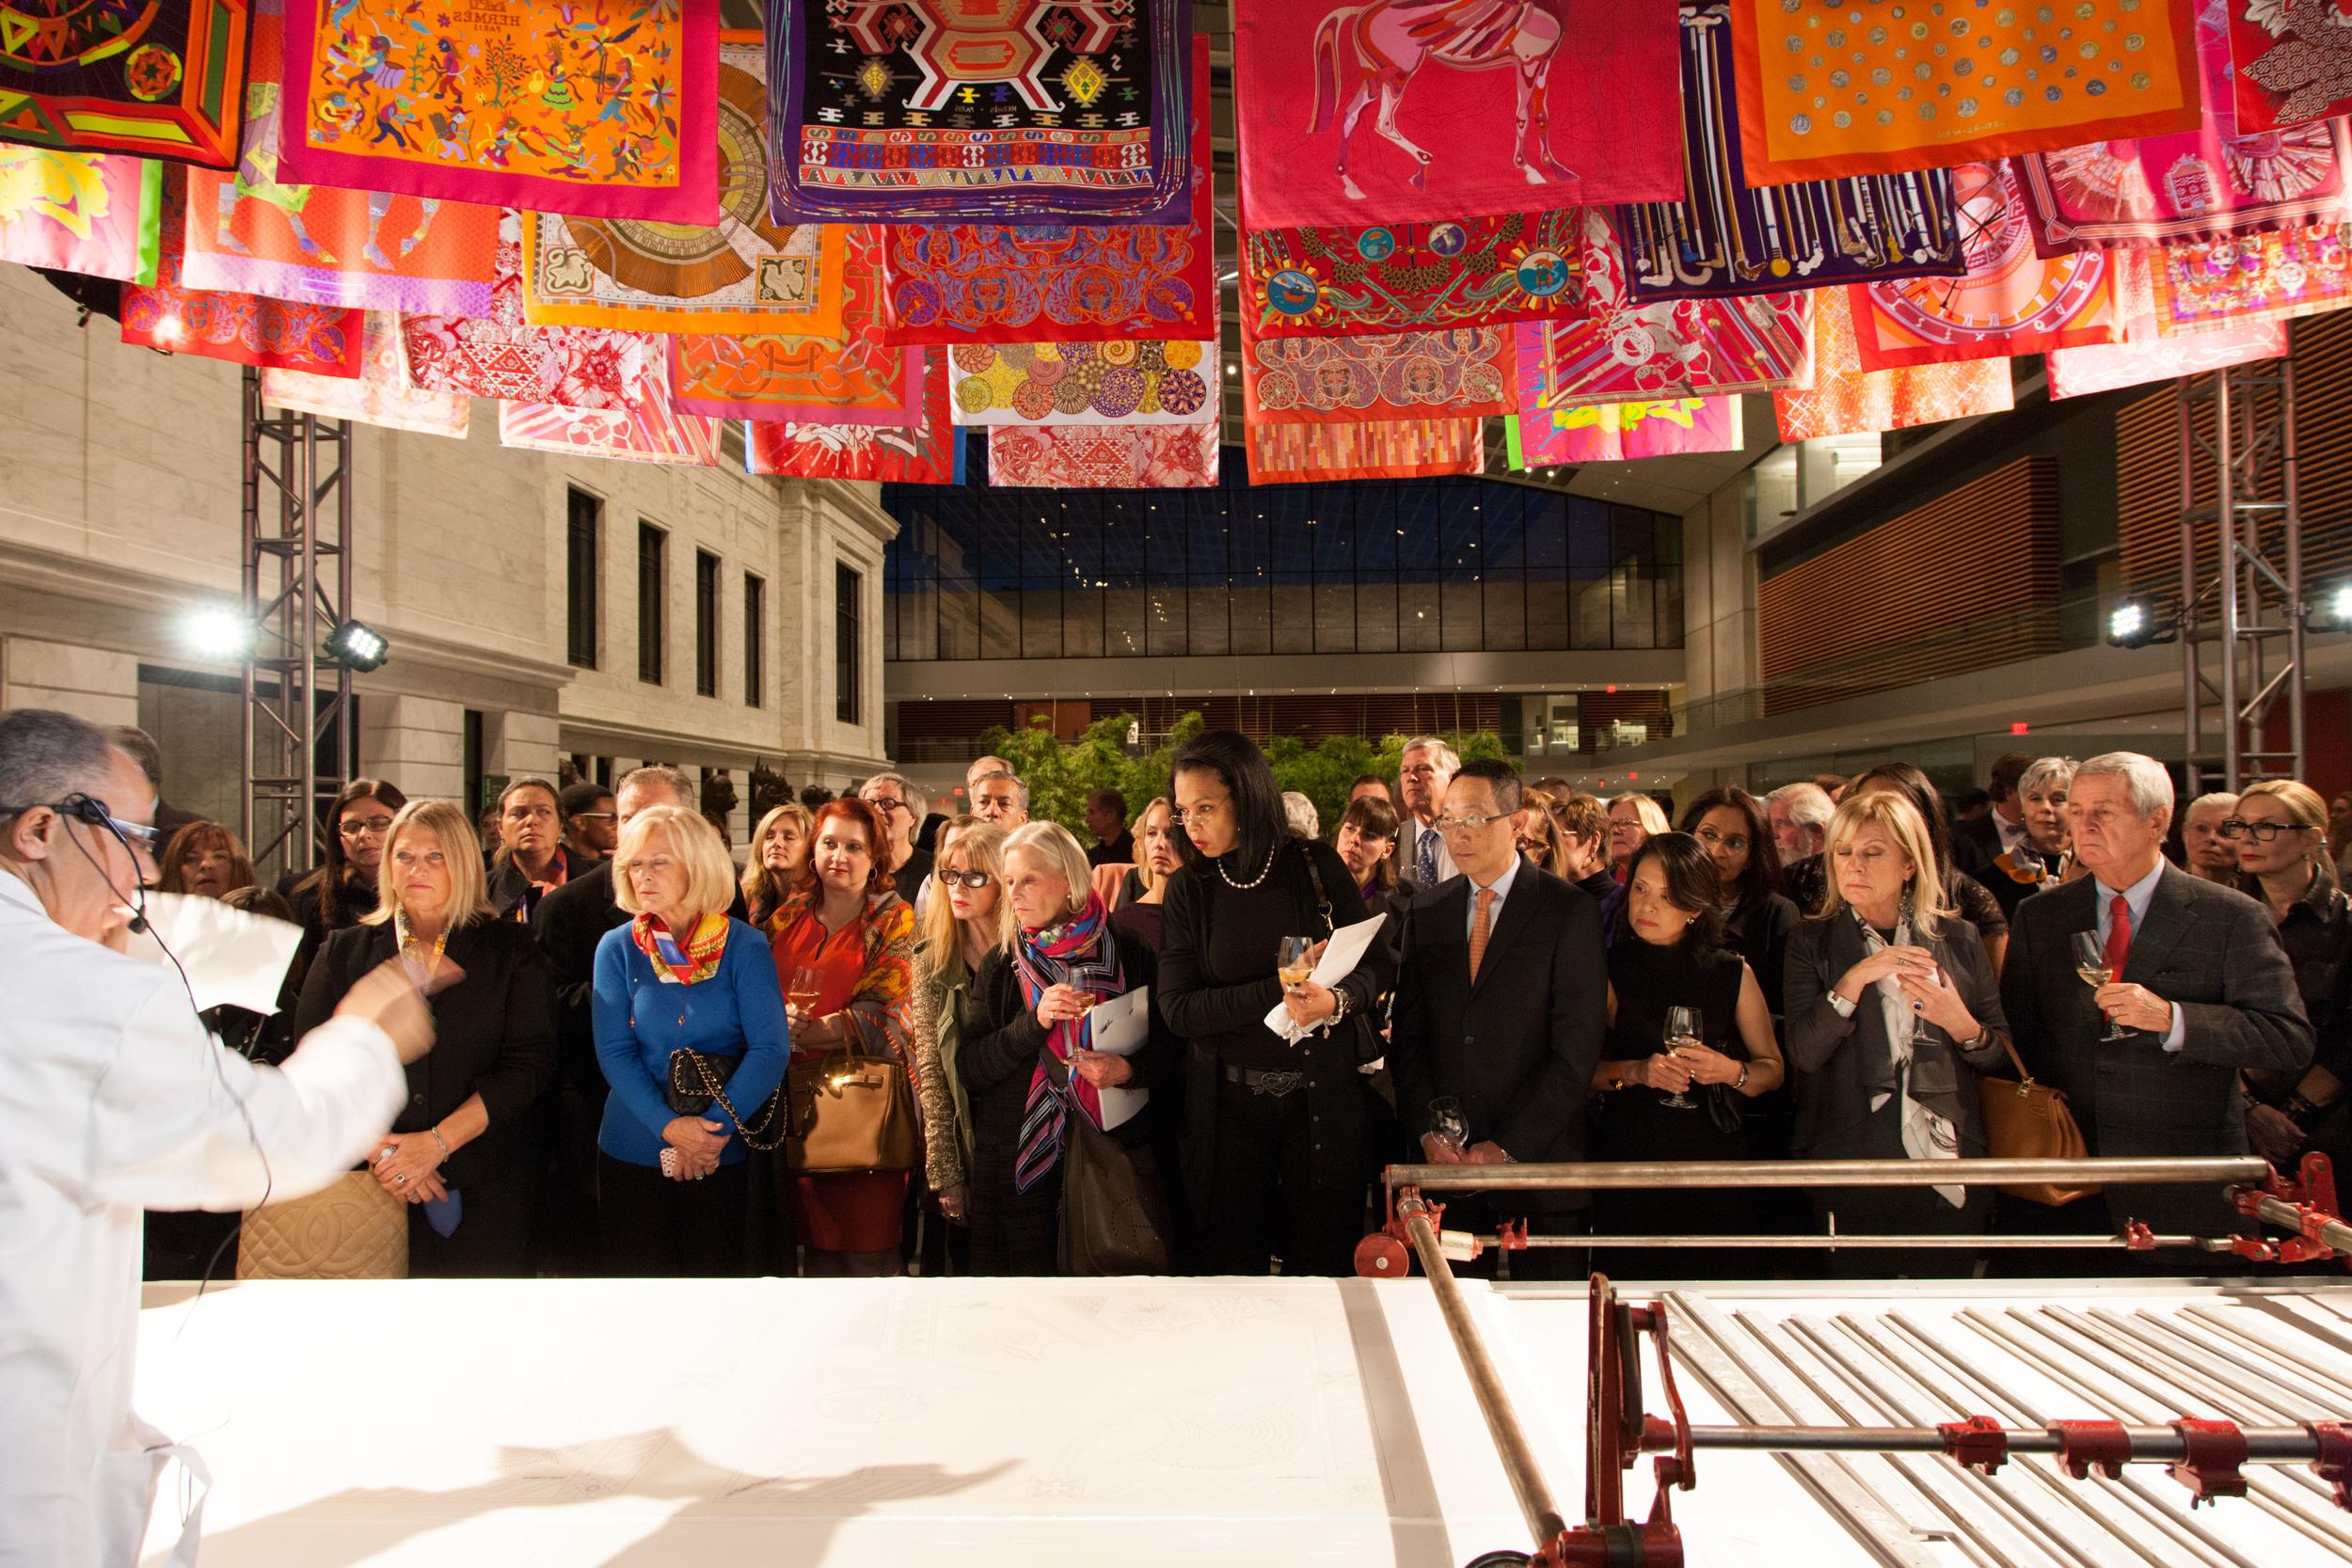 Hermes Silk Printing Exhibition & Demonstration